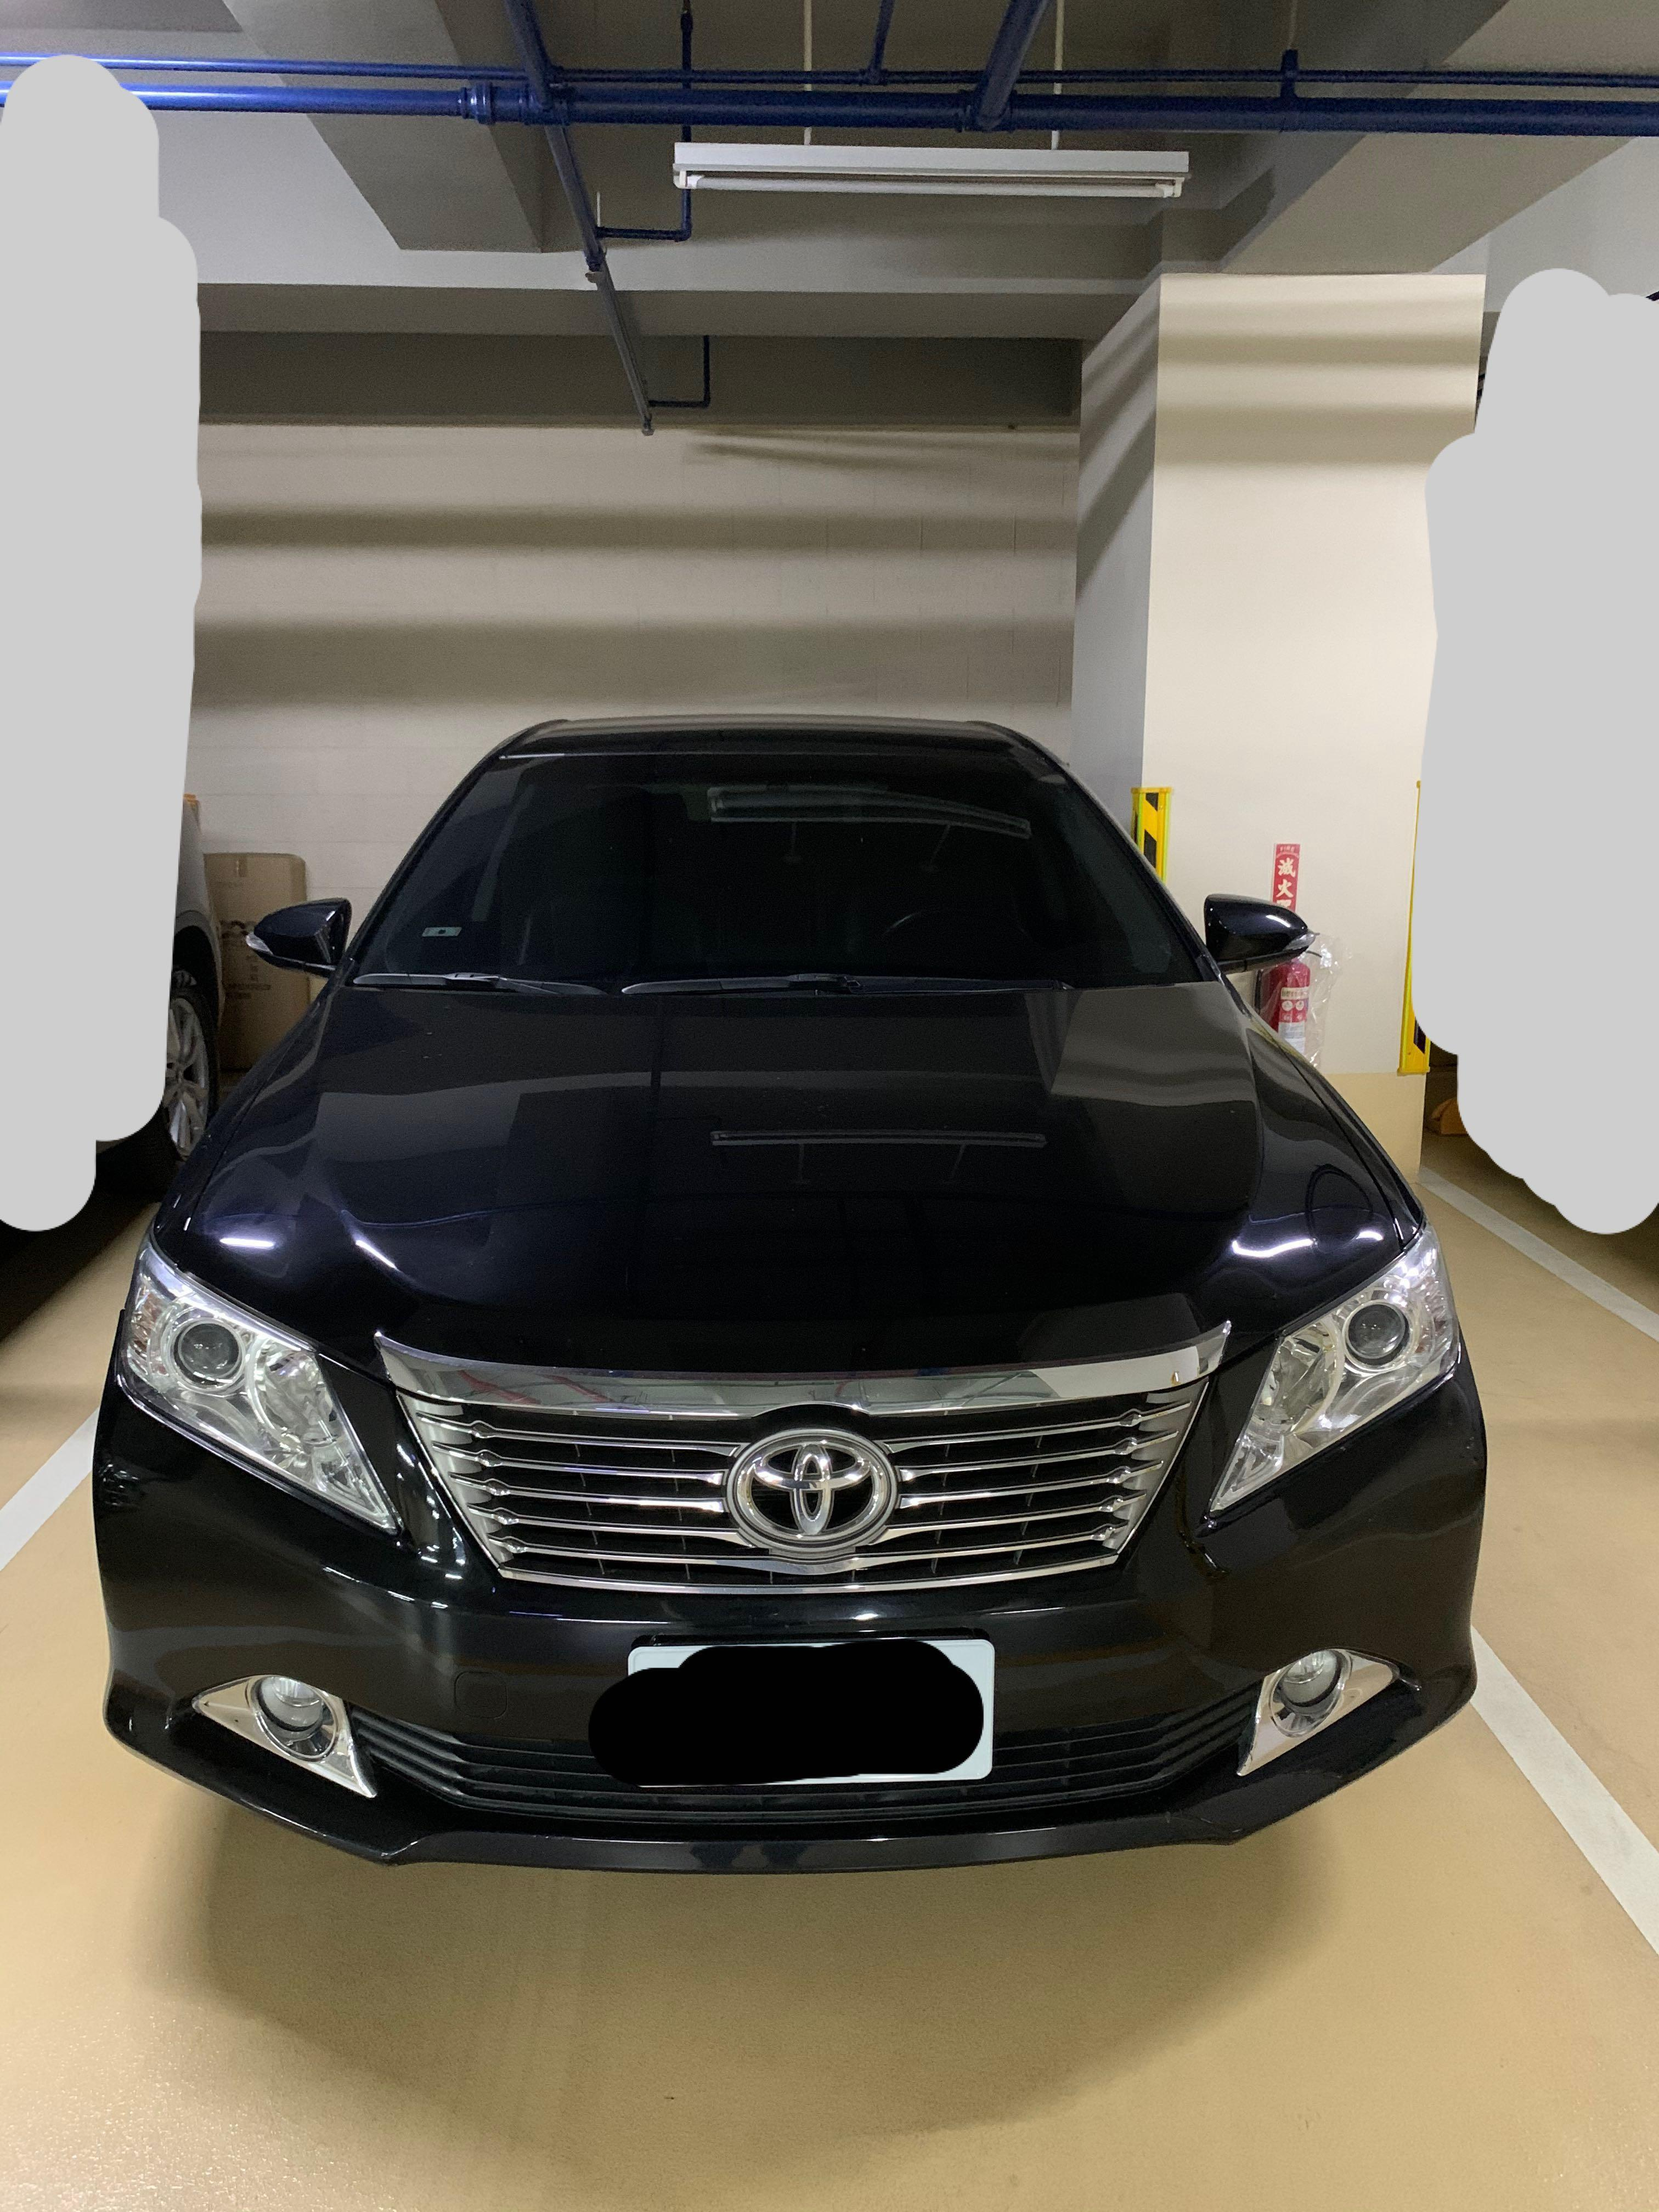 Camry 2013 2.0 黑色 轎車